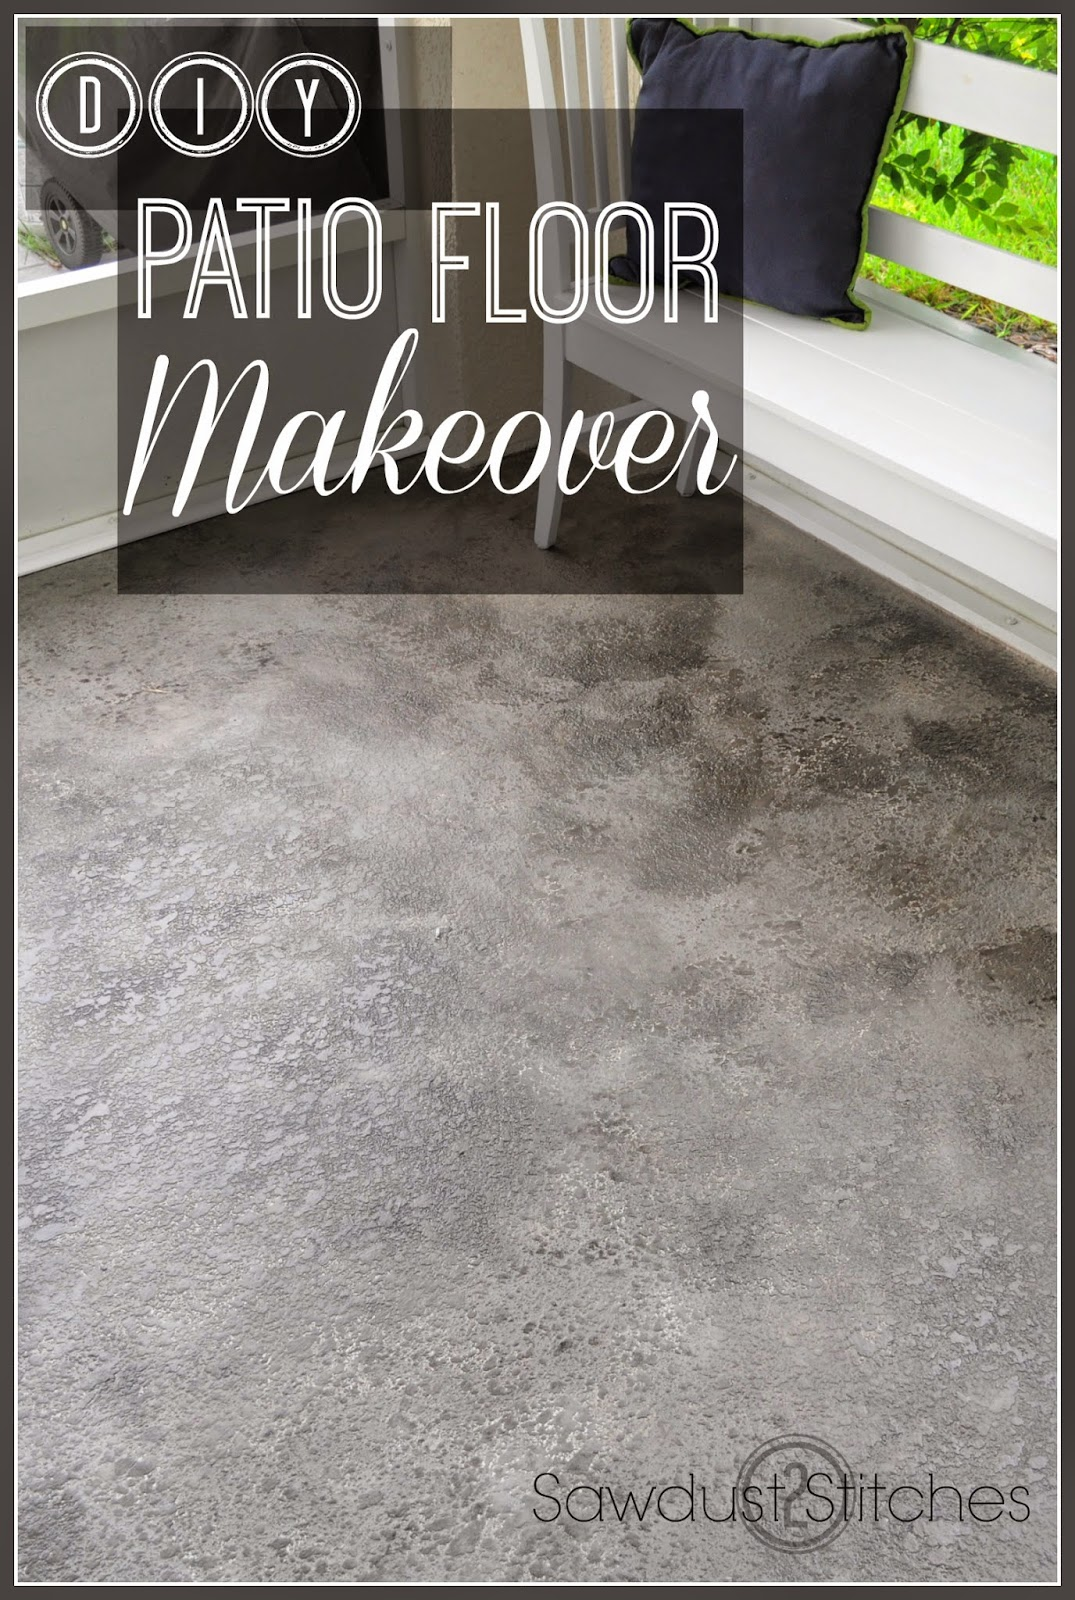 Patio Floor Makeover Sawdust 2 Stitches